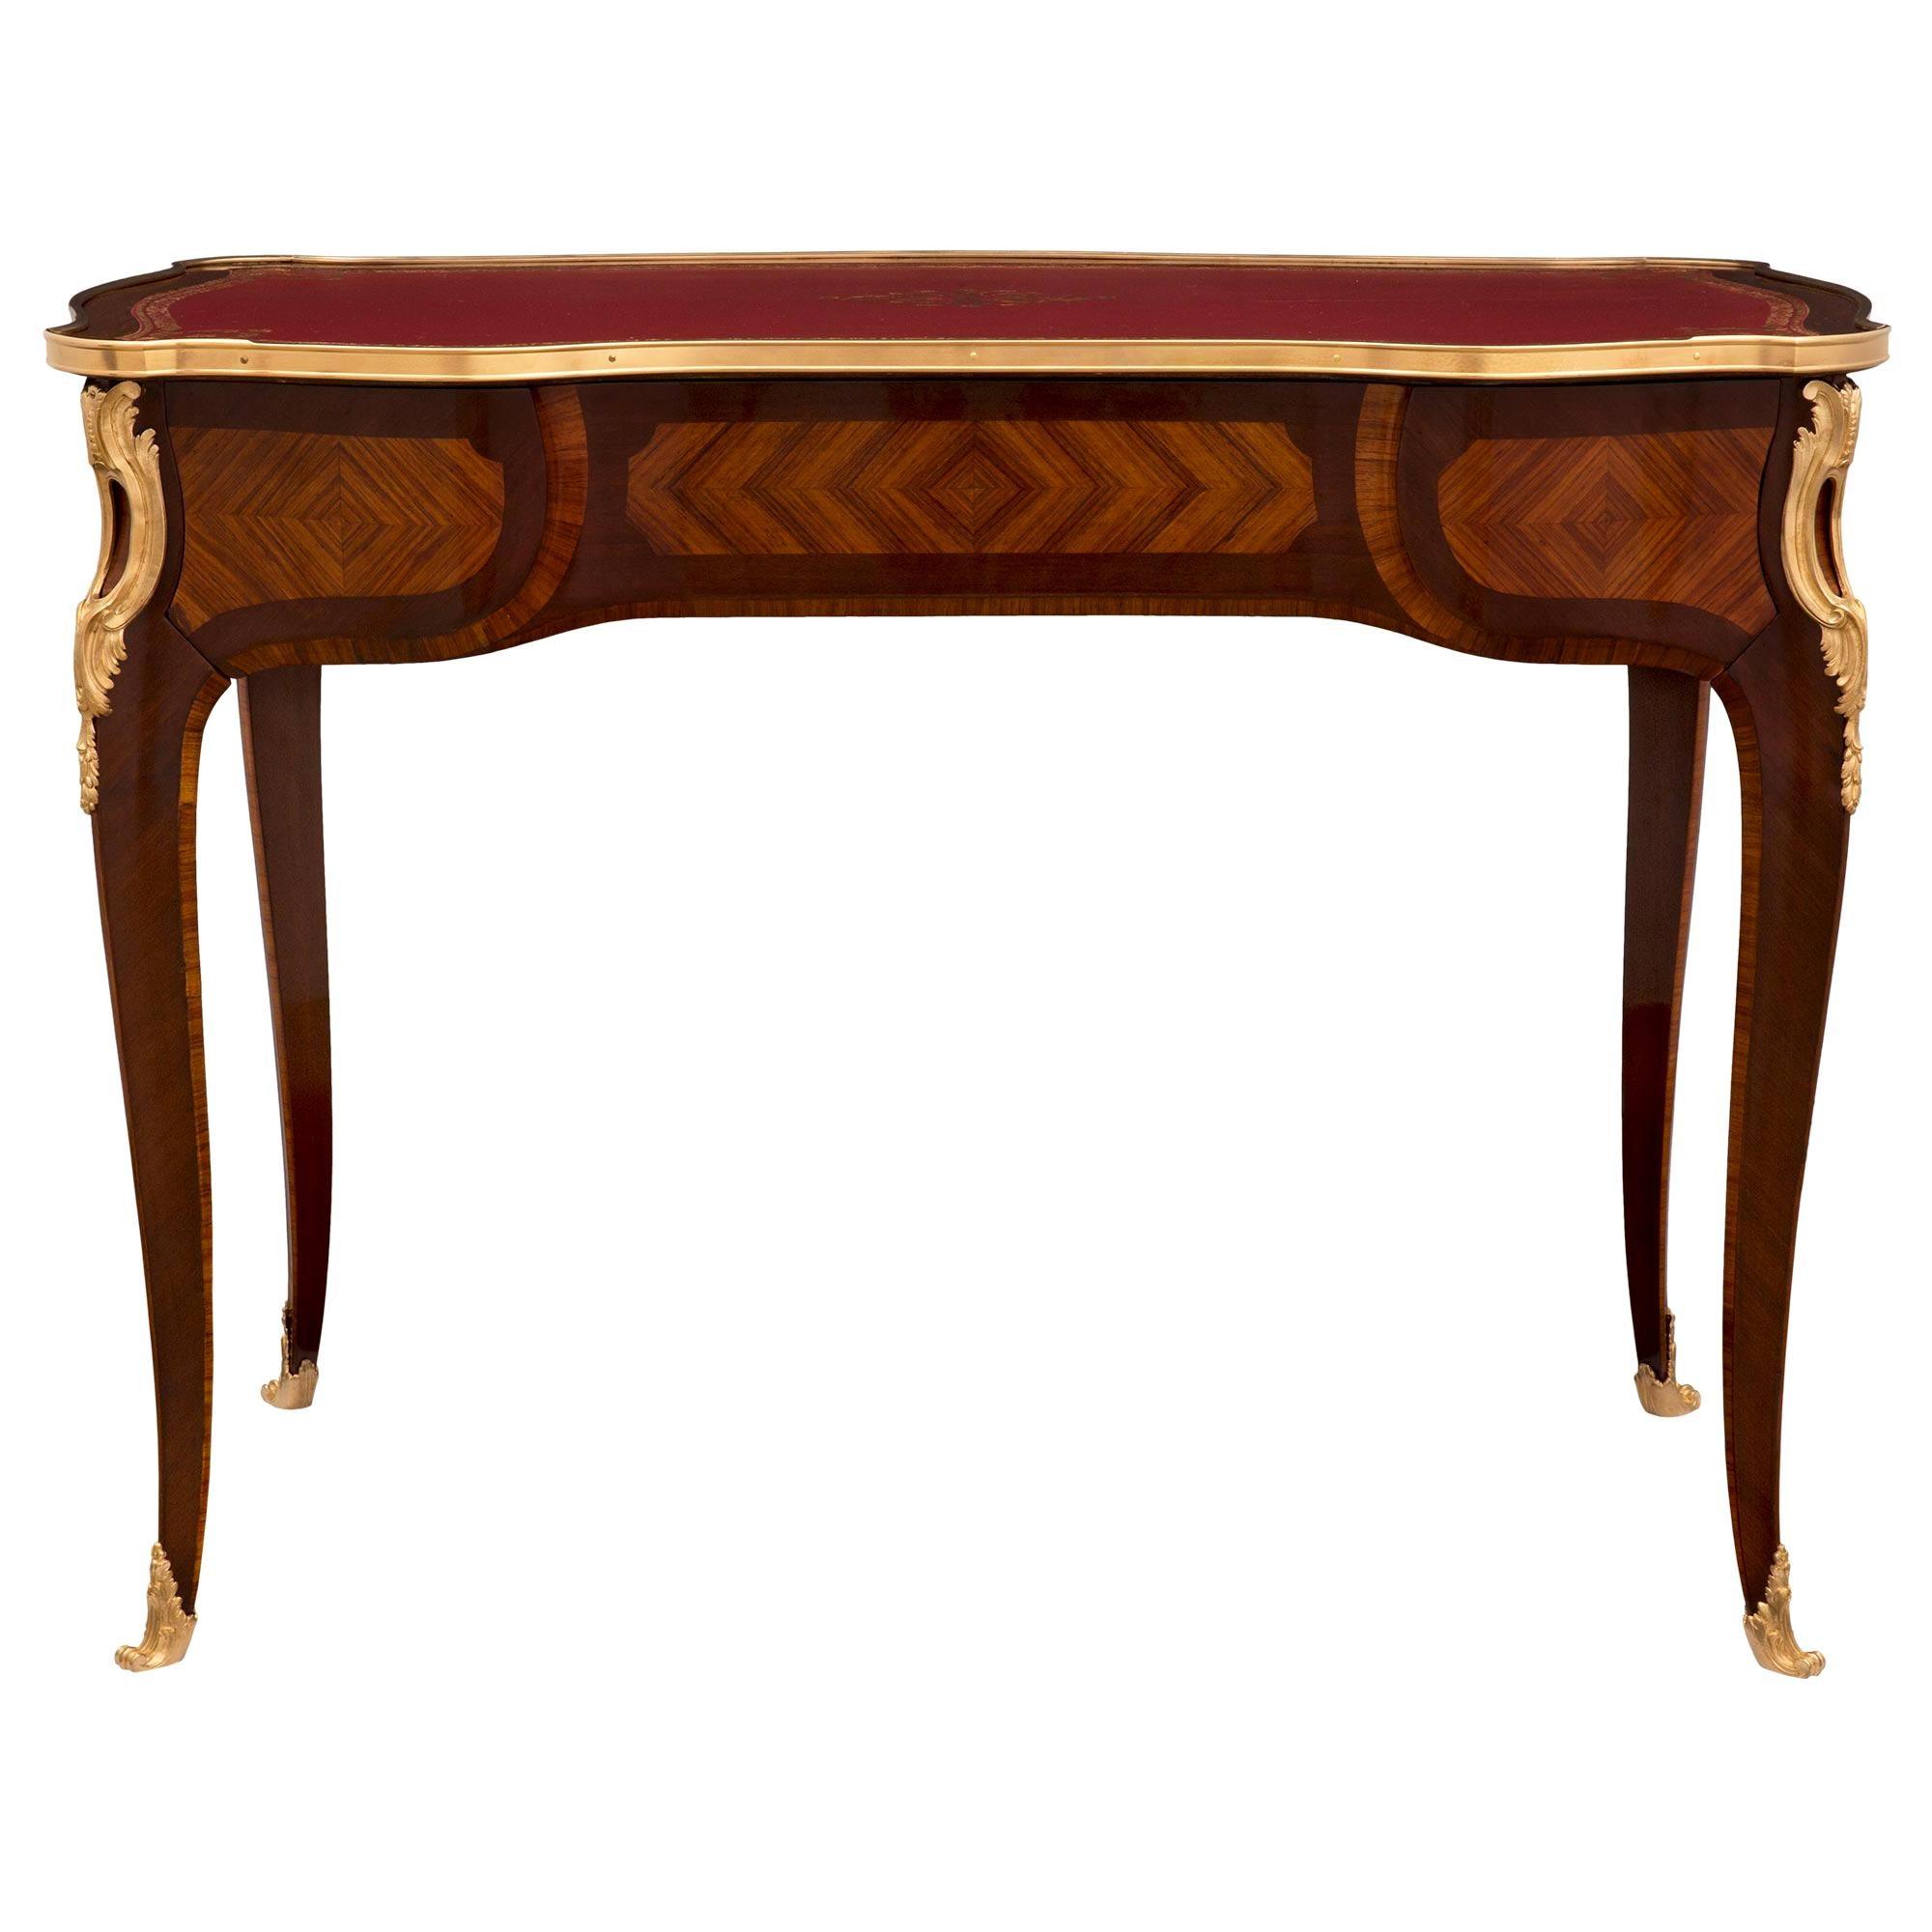 French 19th Century Louis XV St. Kingwood, Tulipwood and Ormolu Desk